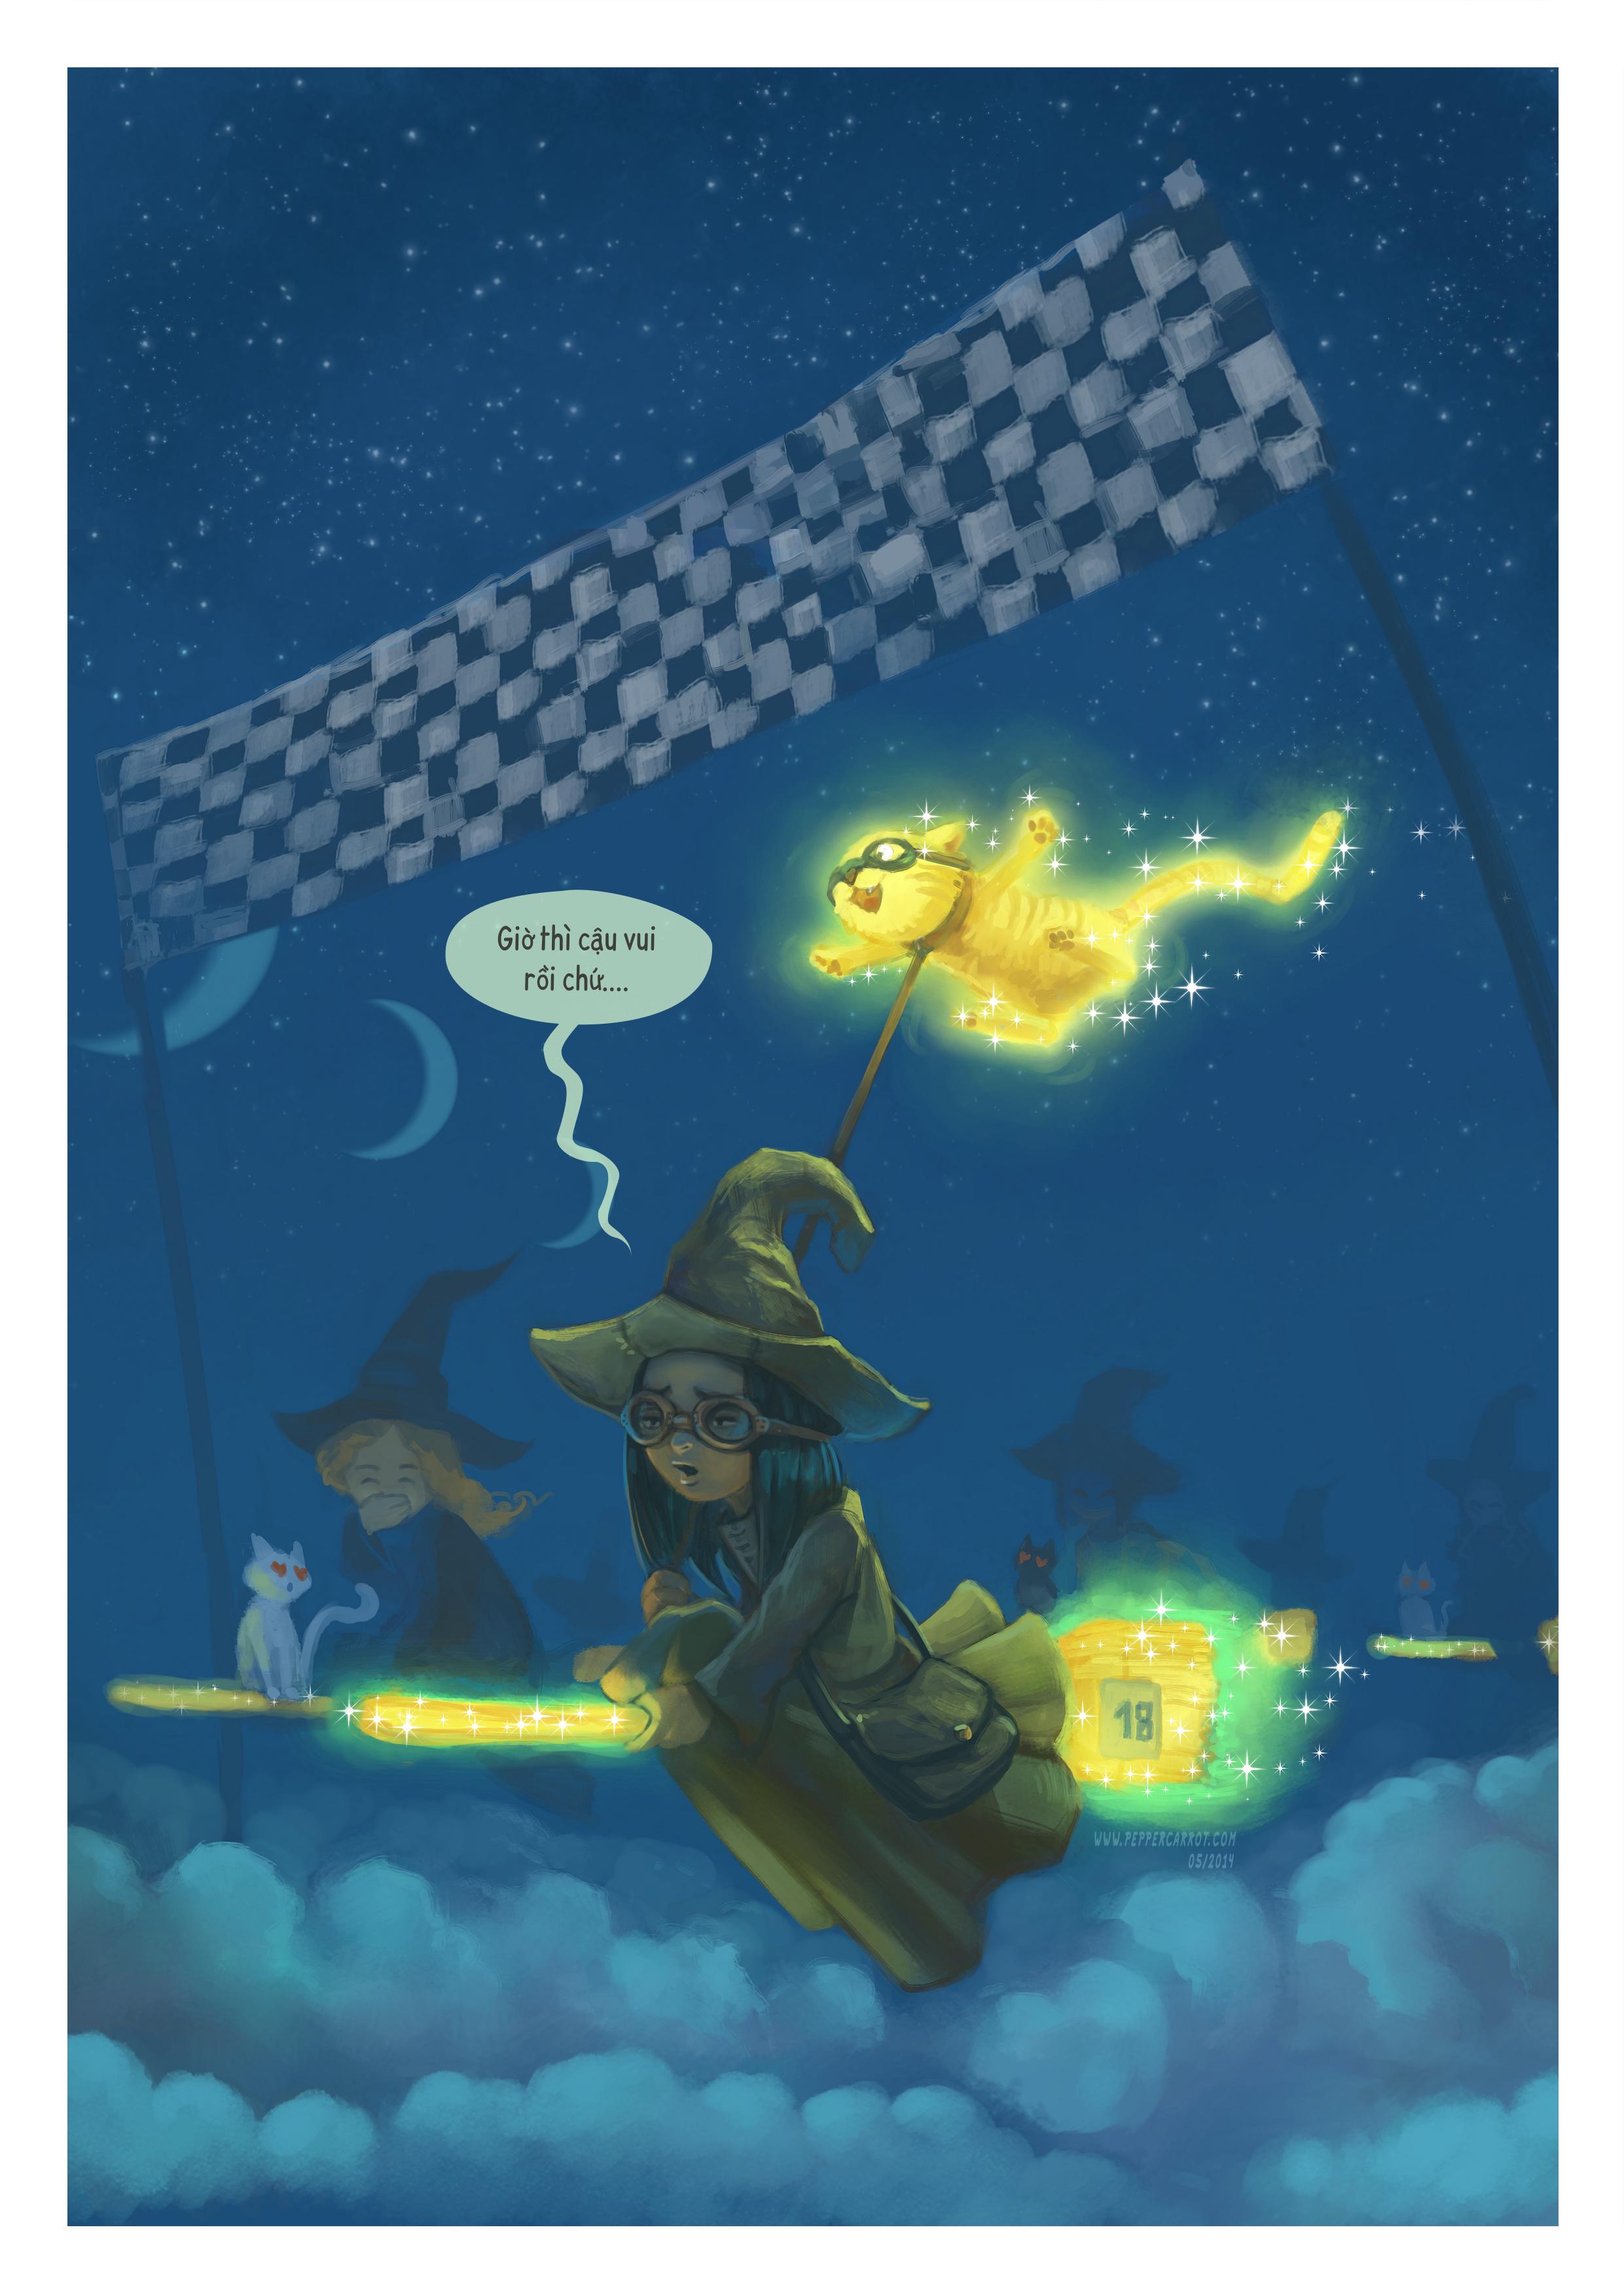 A webcomic page of Pepper&Carrot, Tập 1 [vi], trang 3